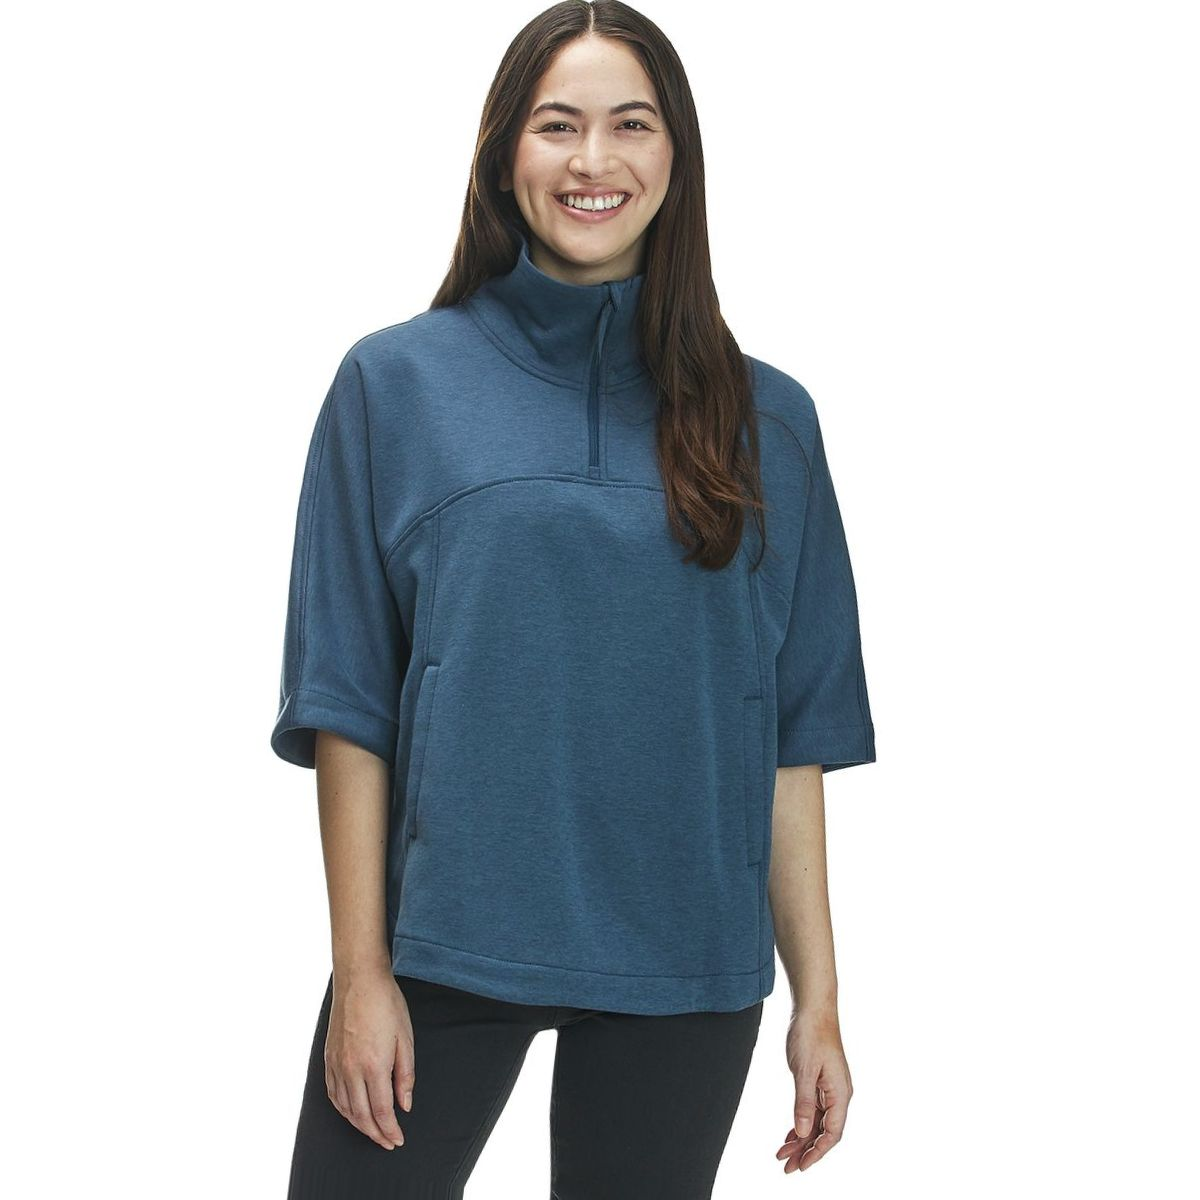 The North Face Slacker Short-Sleeve Poncho - Women's